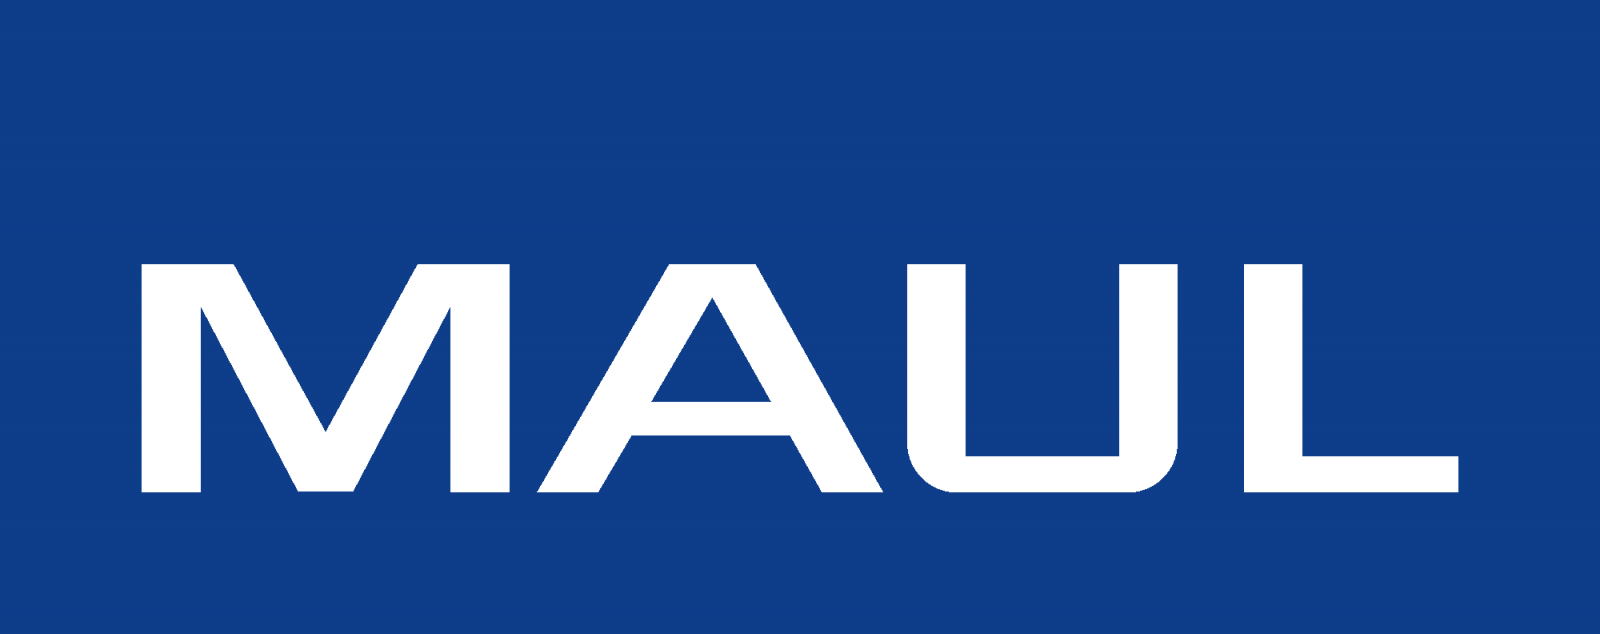 maul-logo-2018